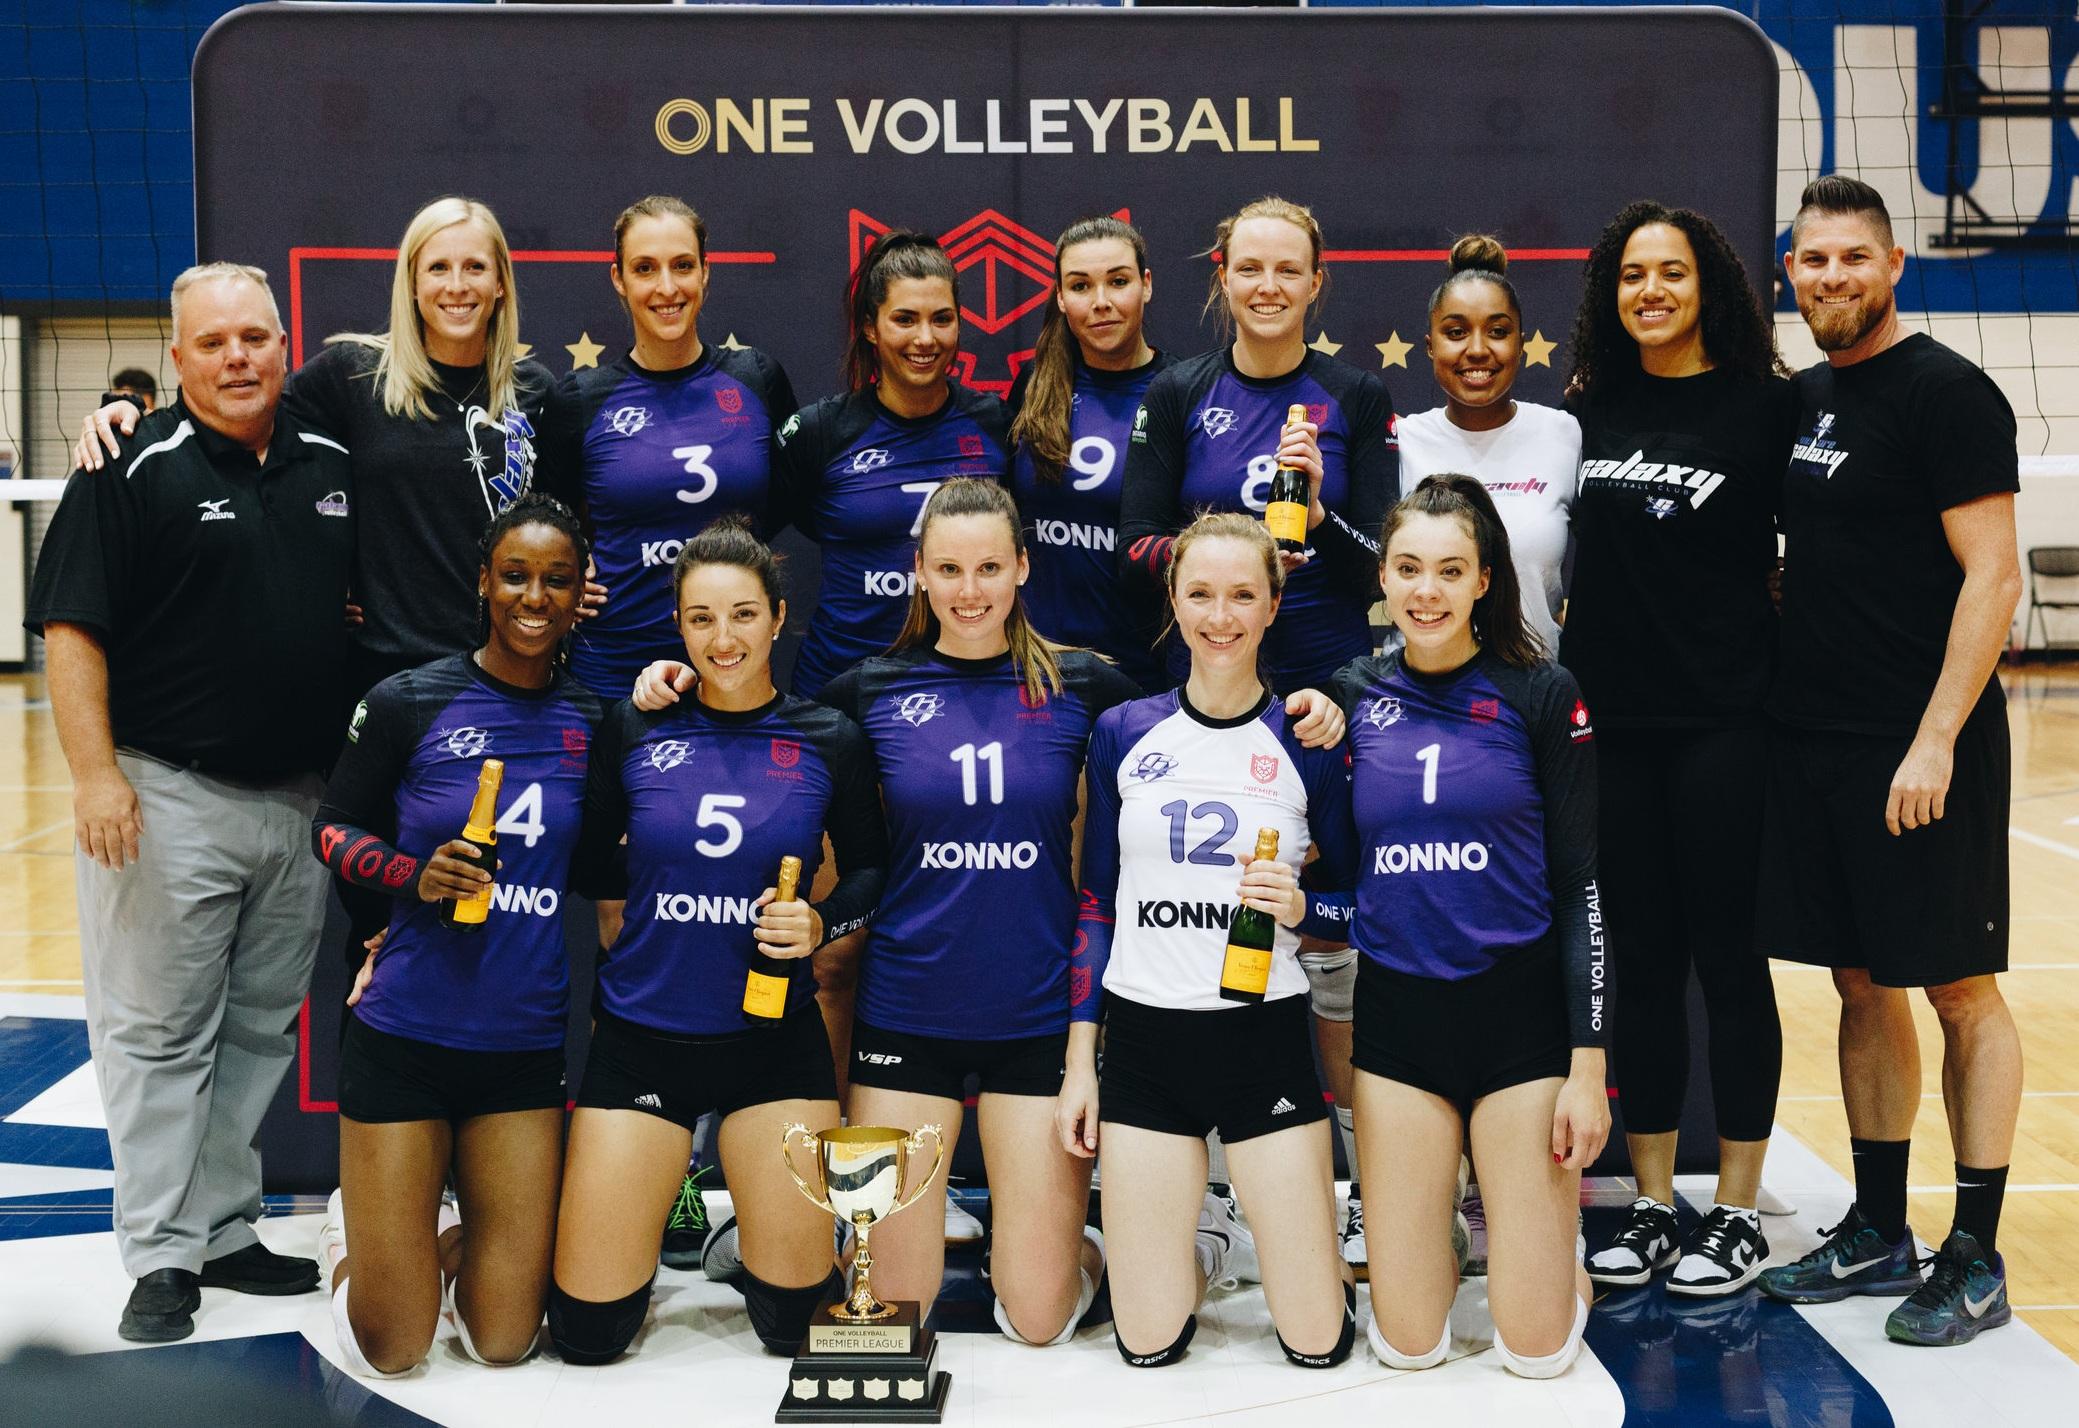 Galaxy Volleyball All-Stars